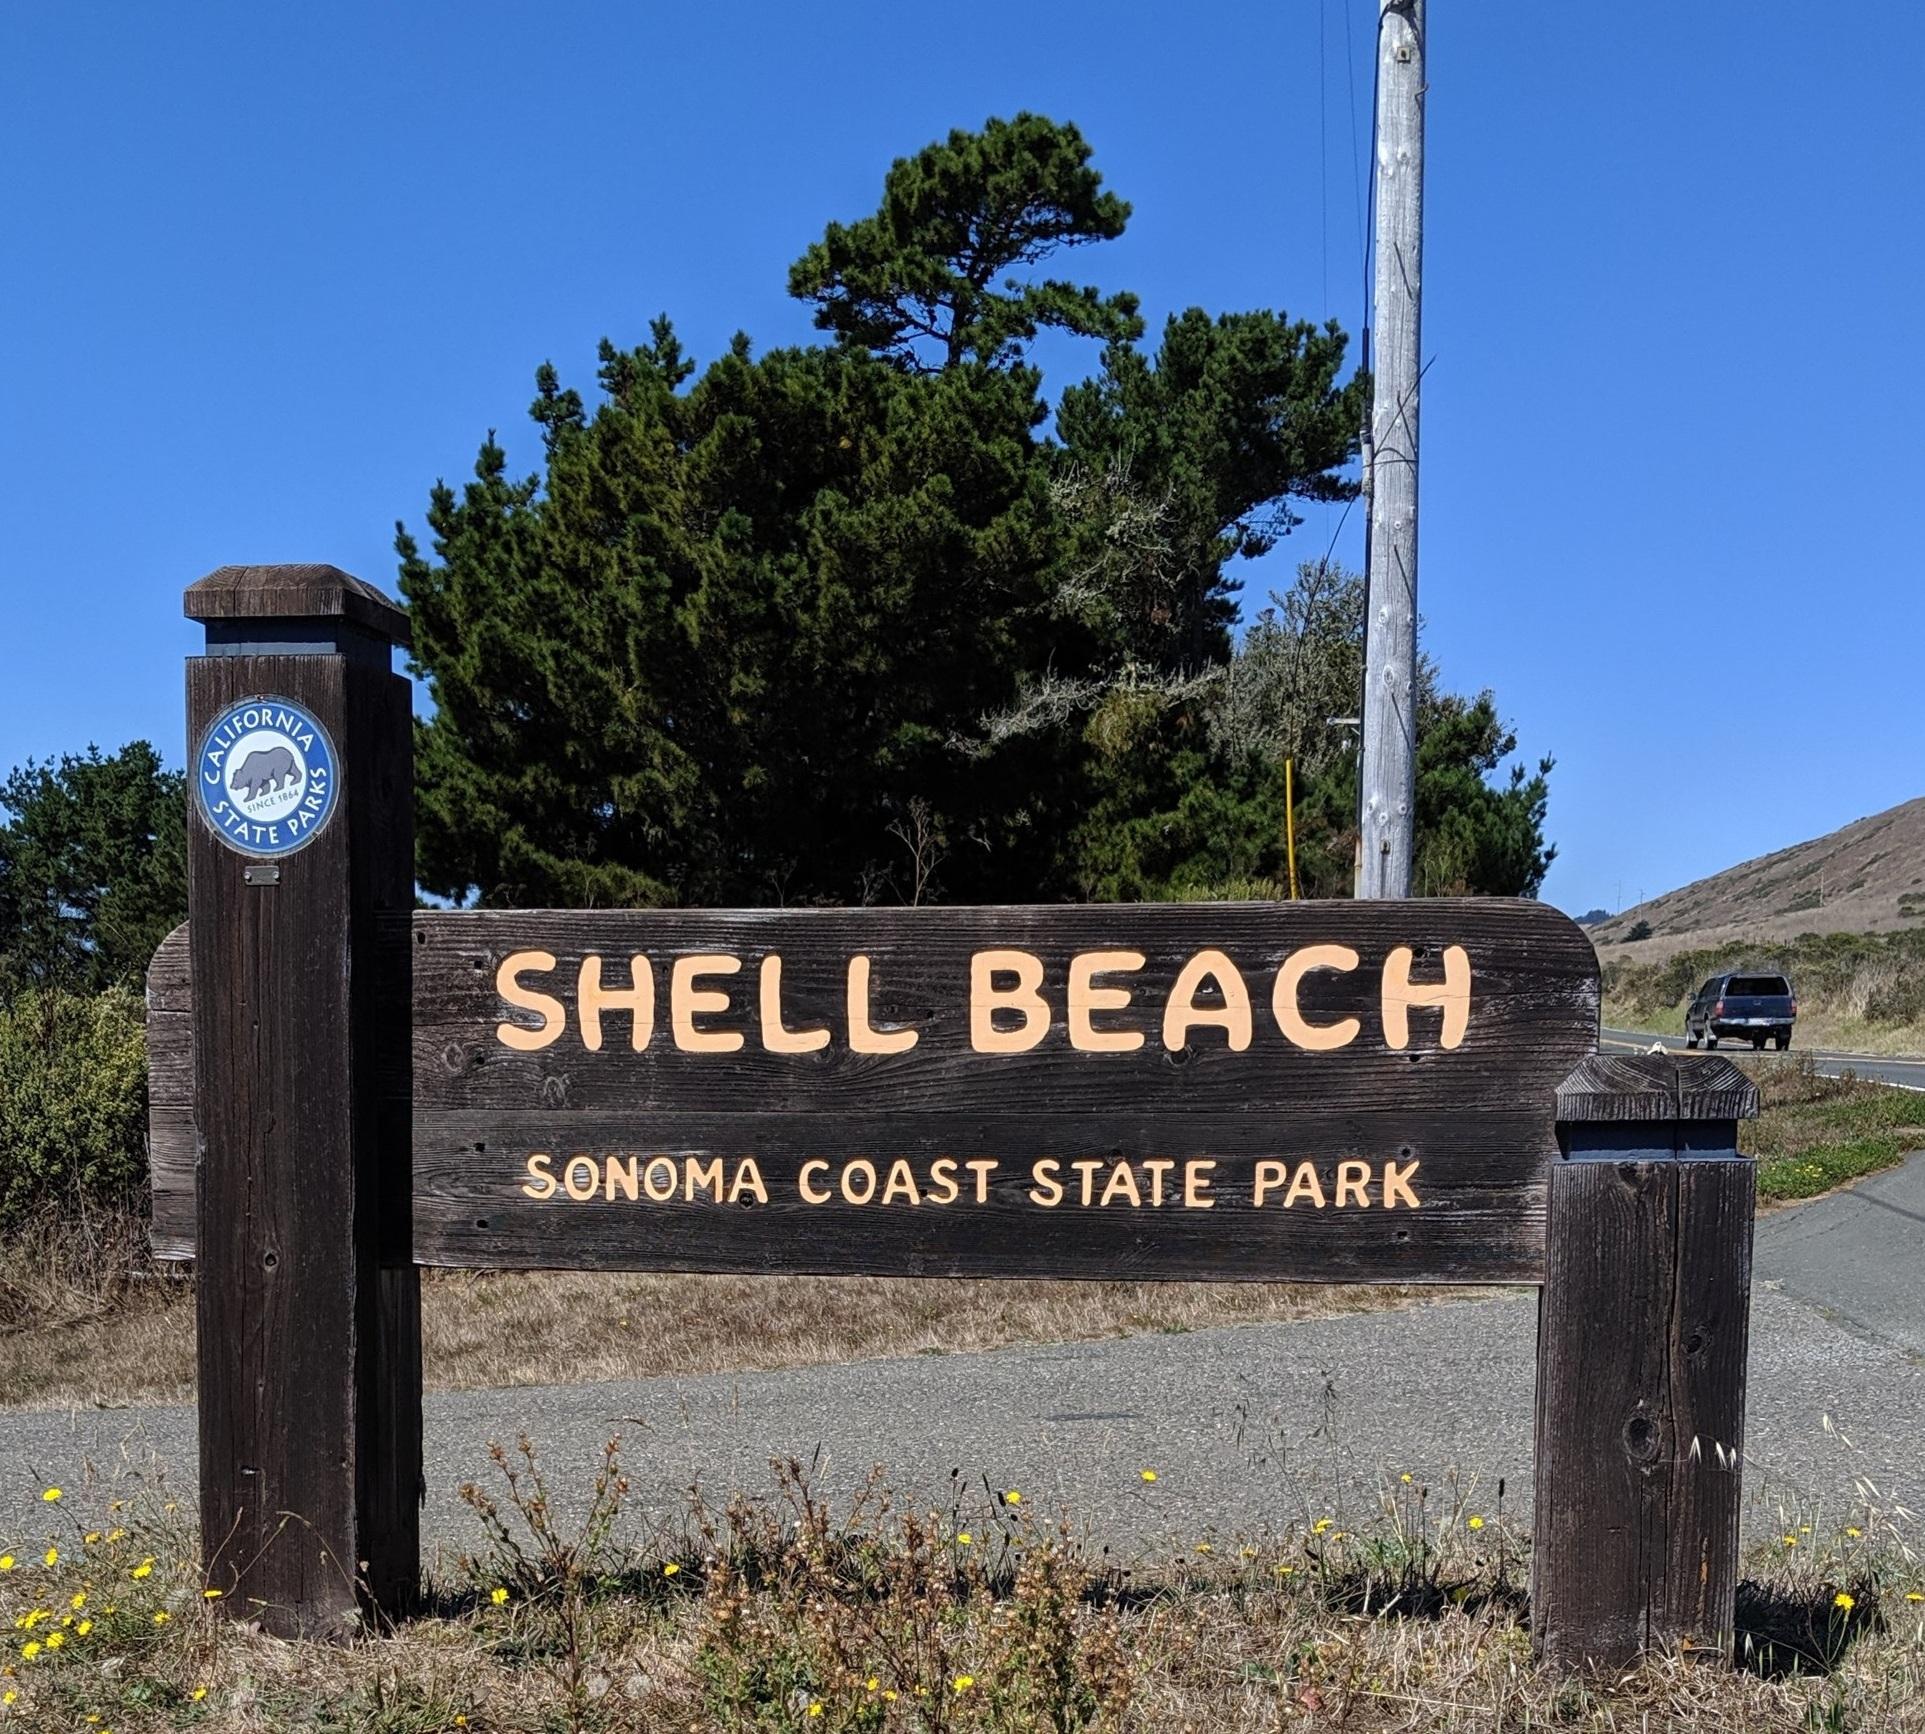 Shell Beach, Sonoma Coast State Park